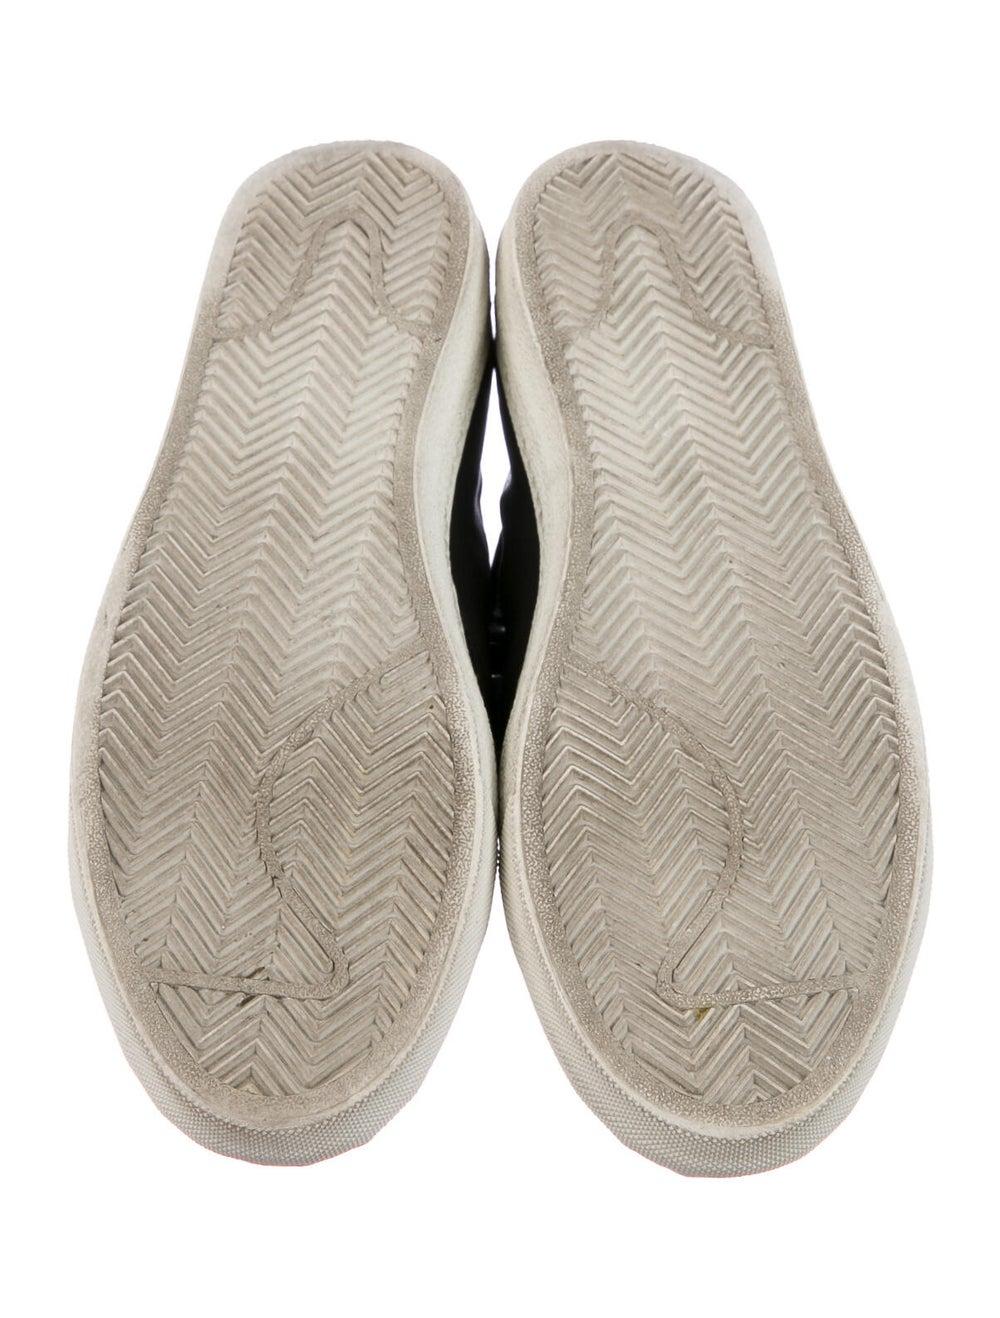 Alexander McQueen Leather Sneakers Blue - image 5